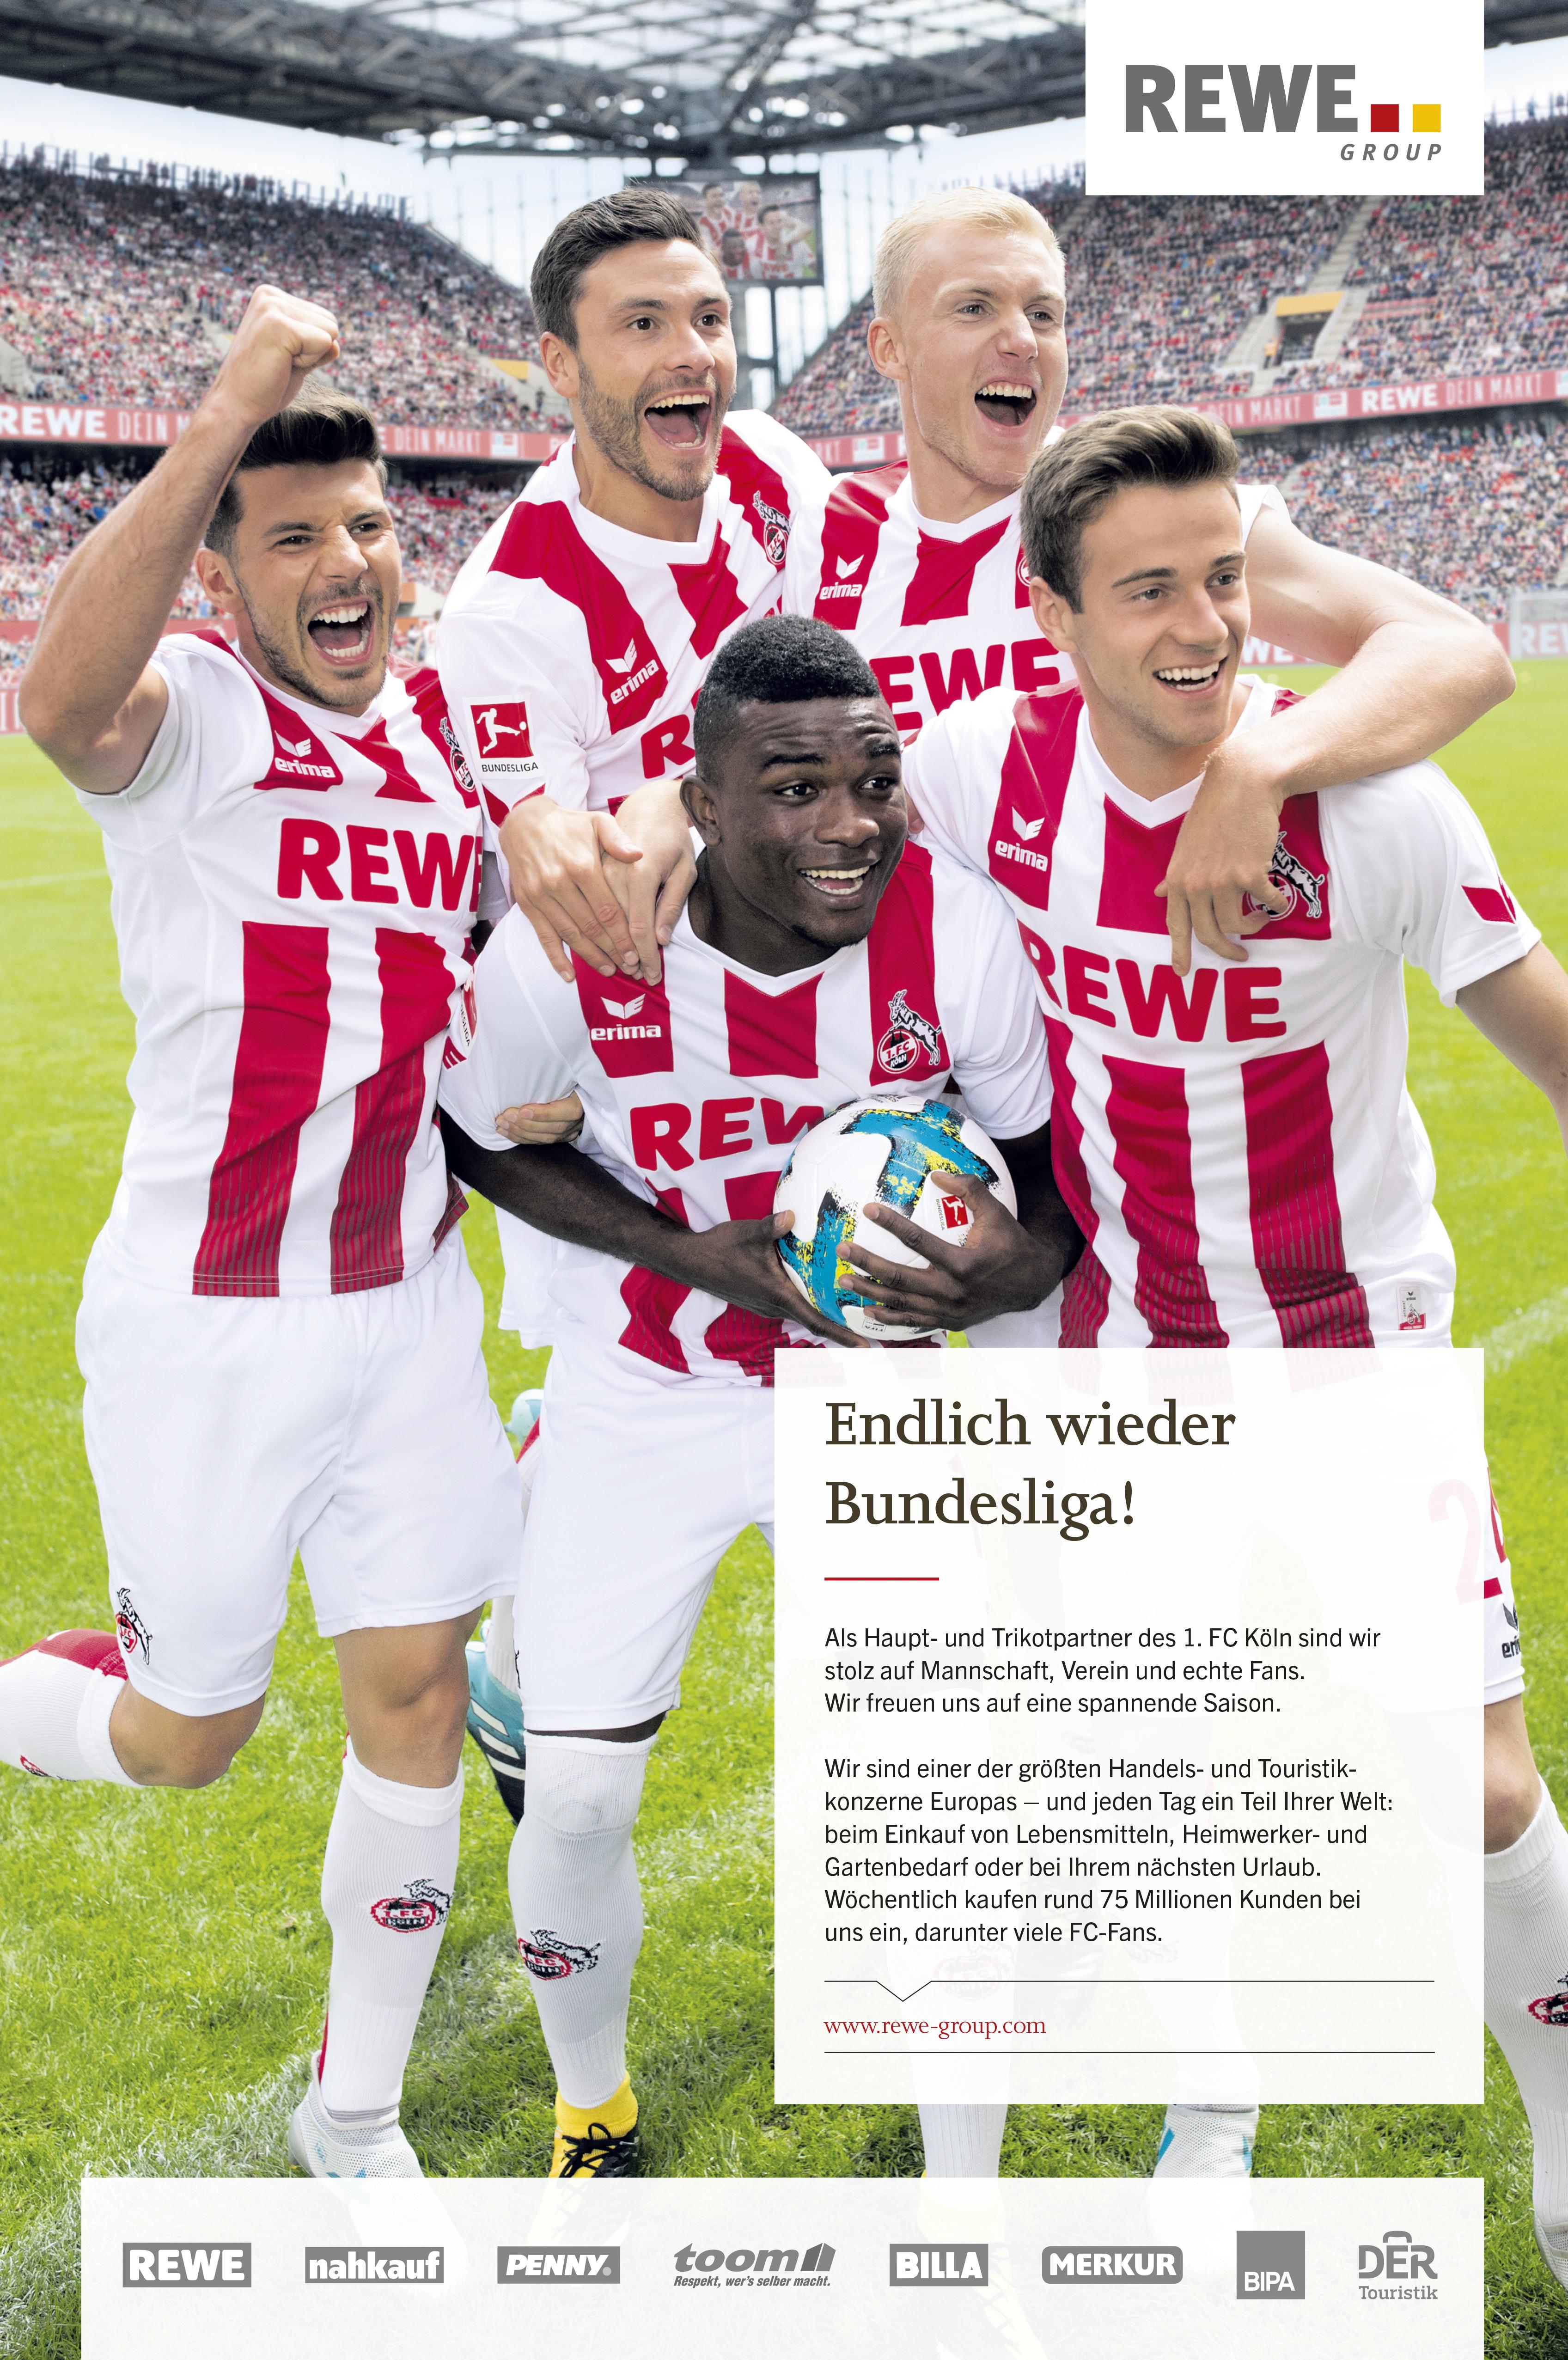 fotografie tomas rodriguez, FC Köln für Rewe